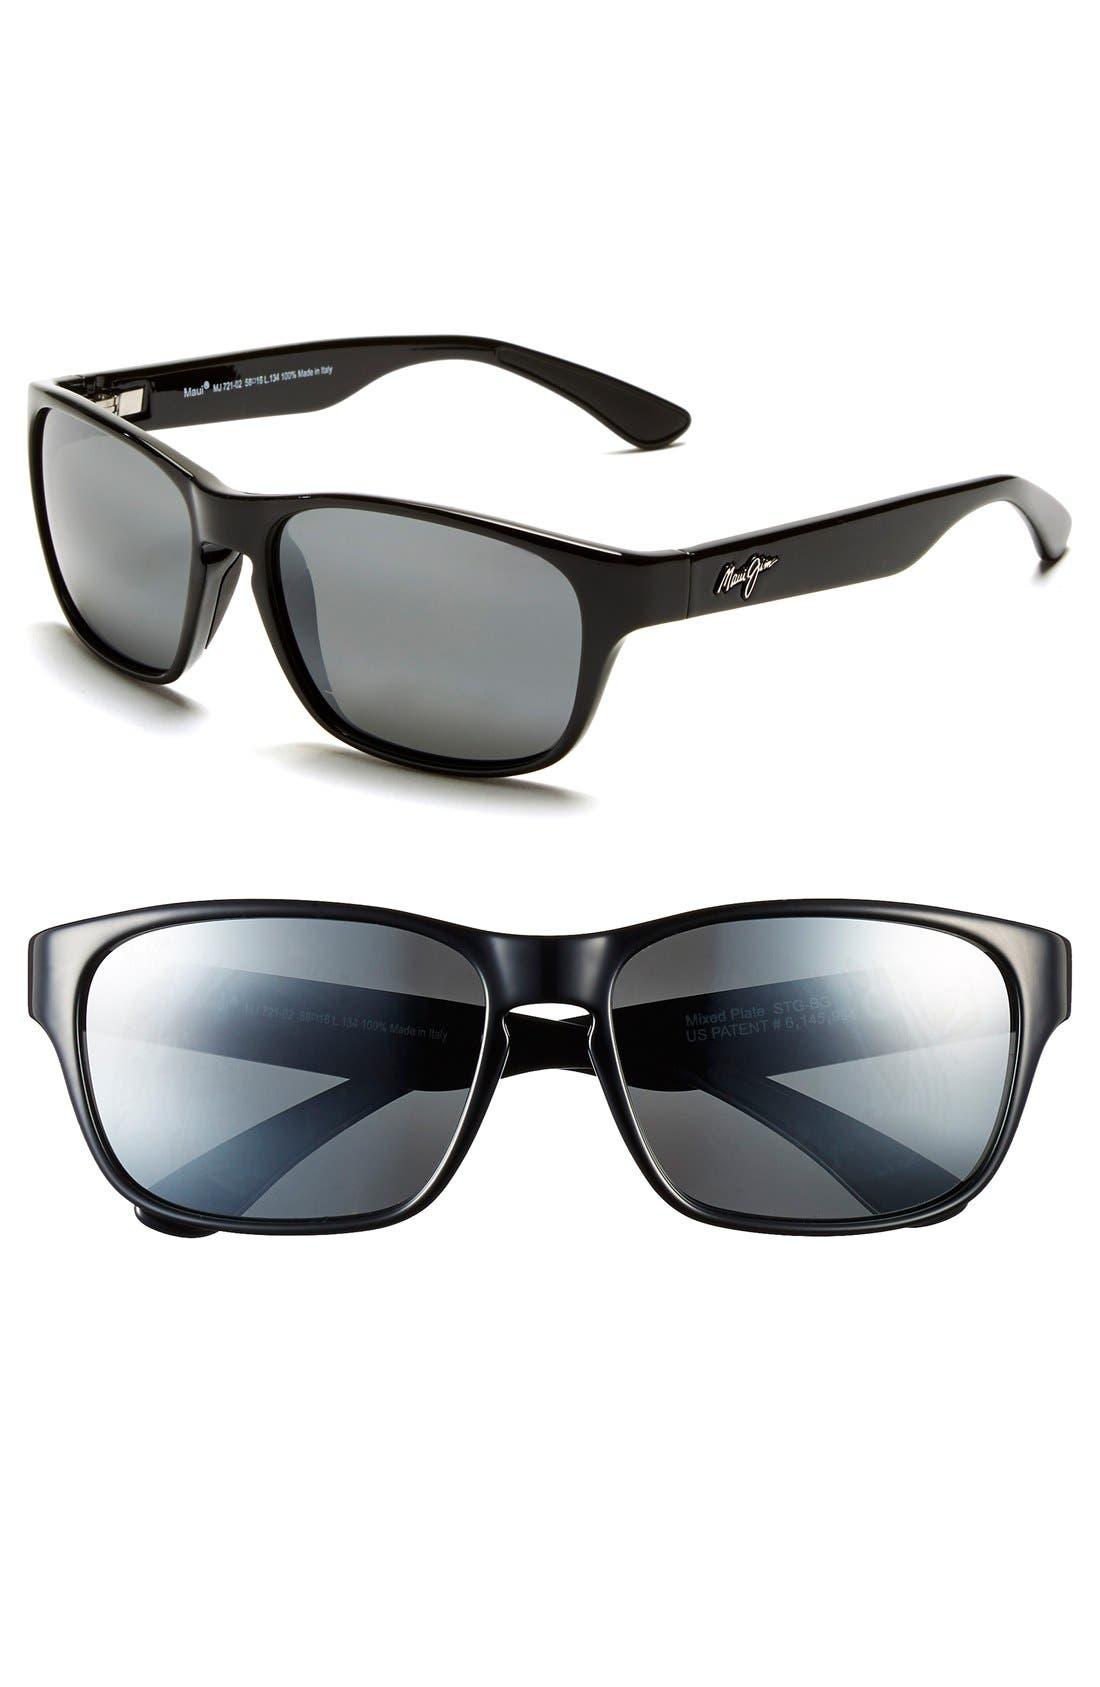 Maui Jim Mixed Plate Sonnenbrille Mattes Tortoise STG-BG Polarisiert 58mm dXQNt